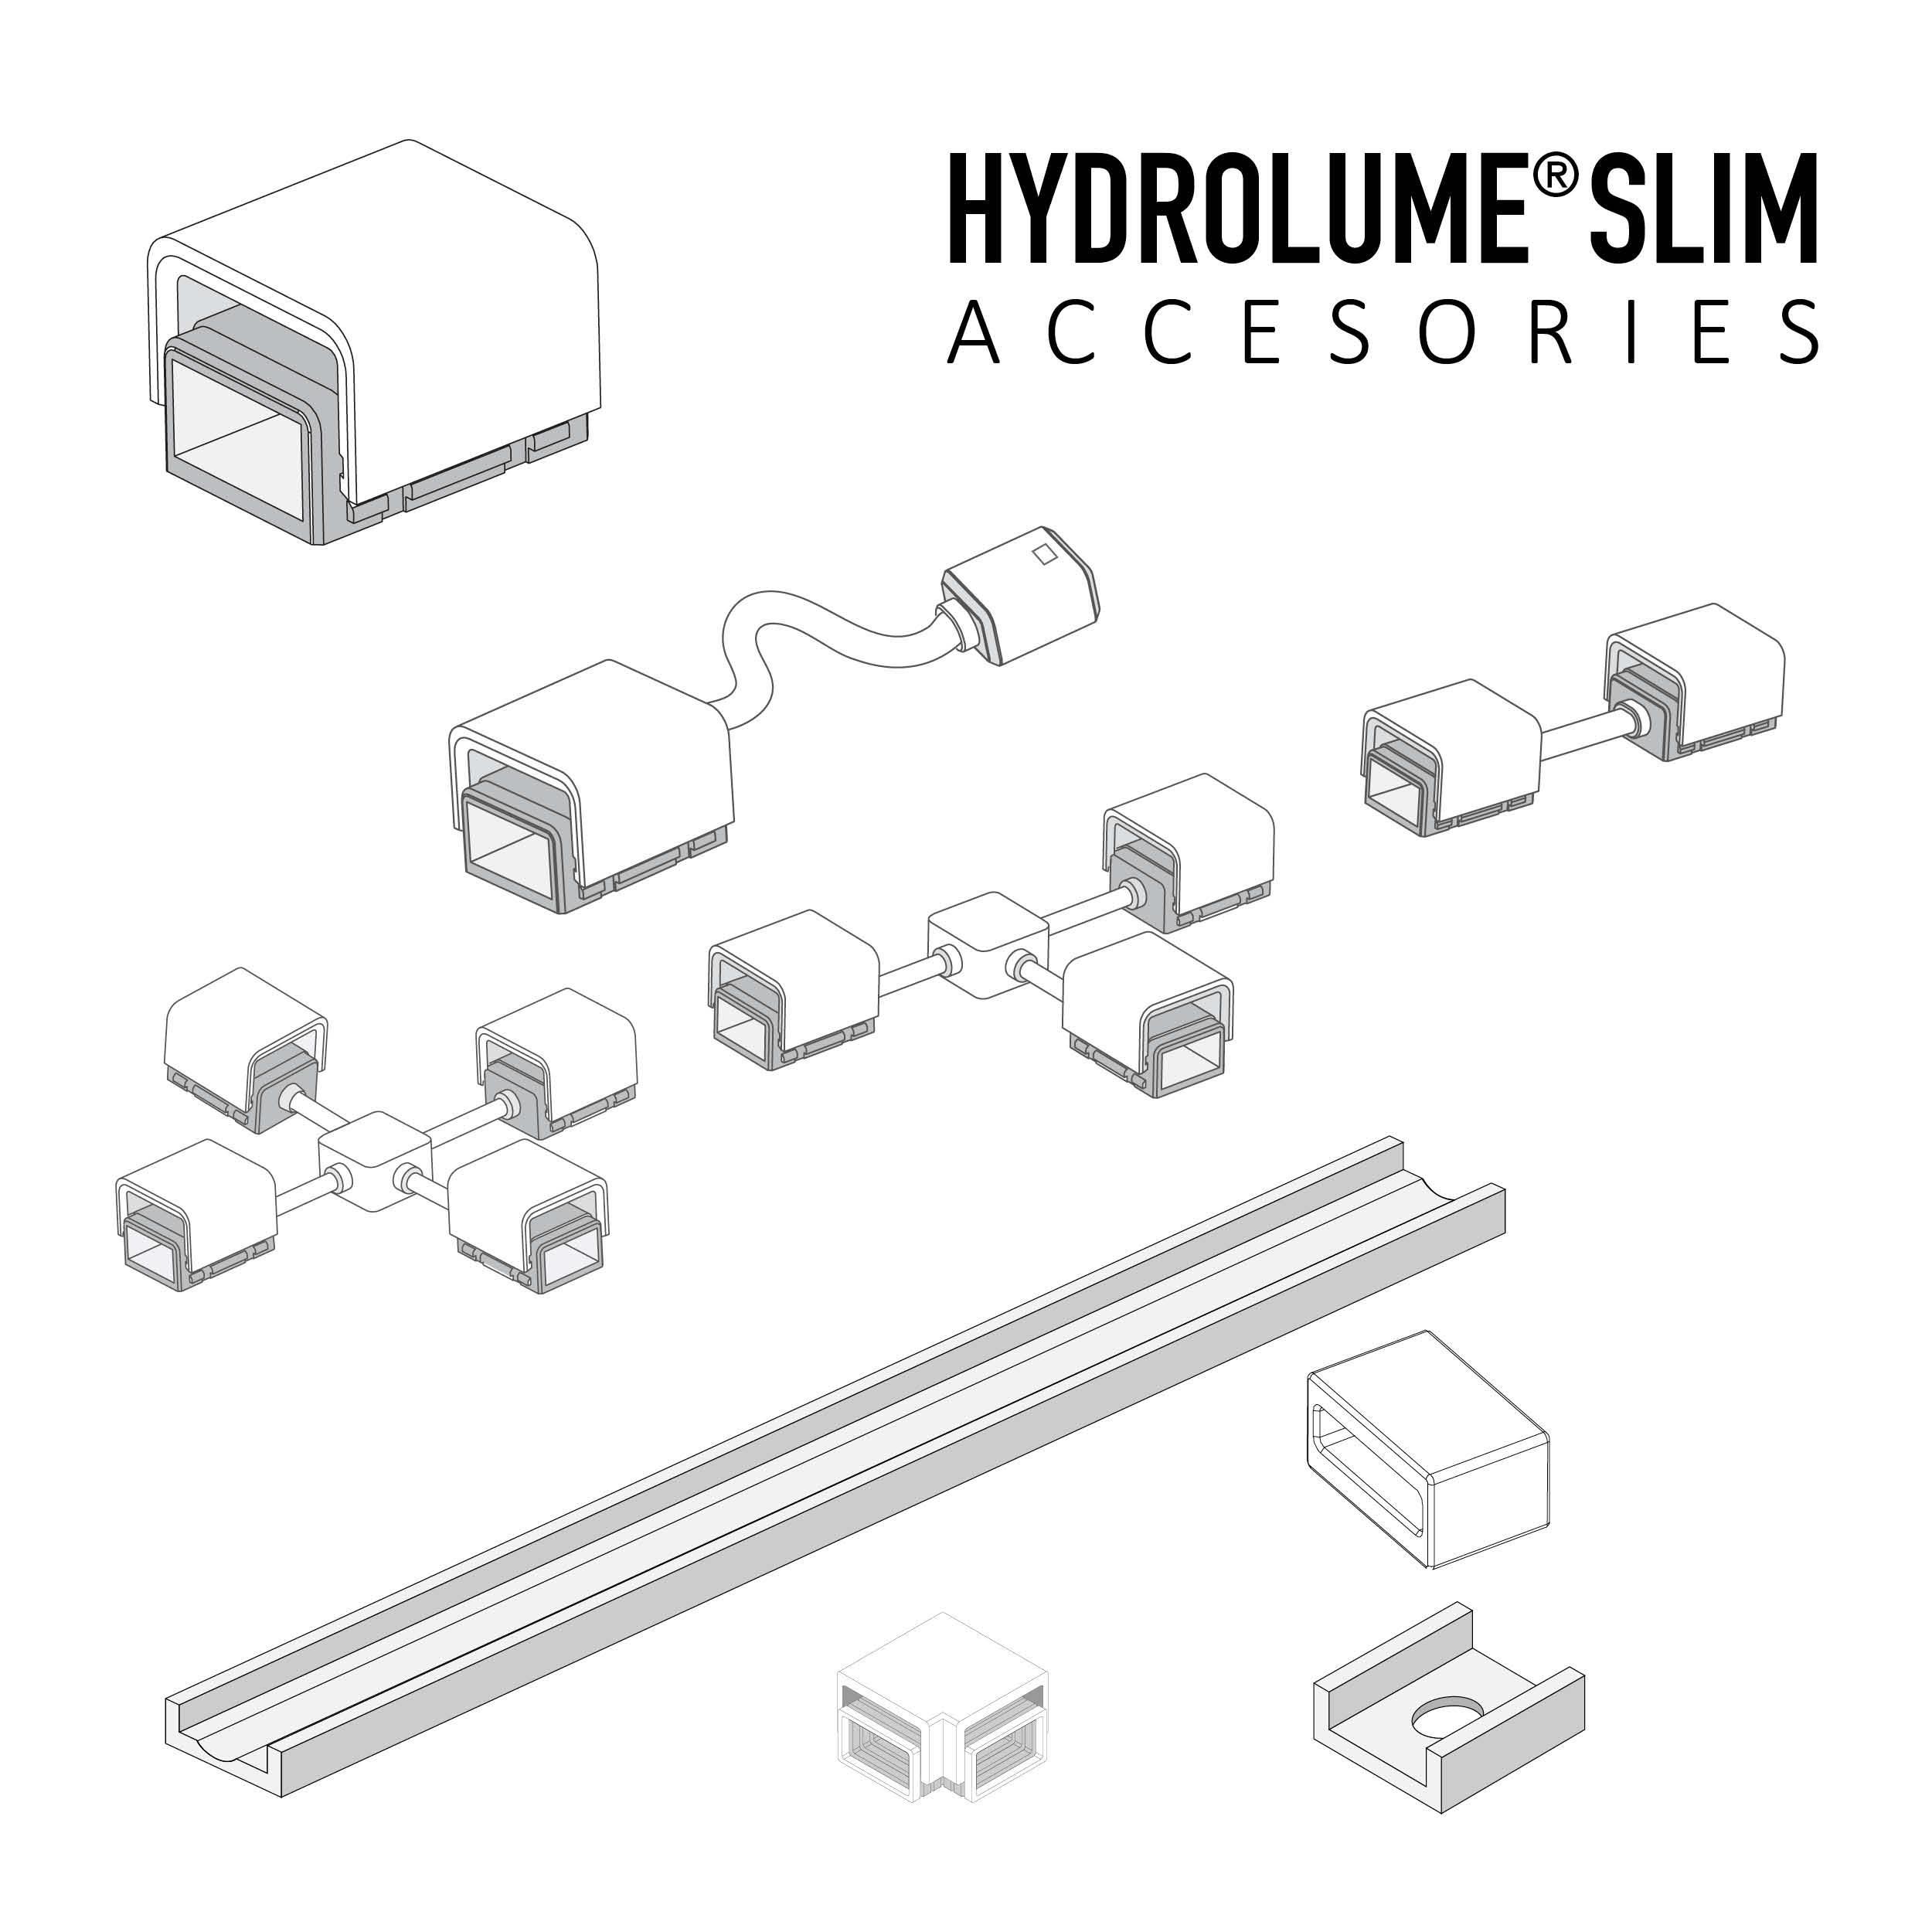 HYDROLUME® SLIM Accessories